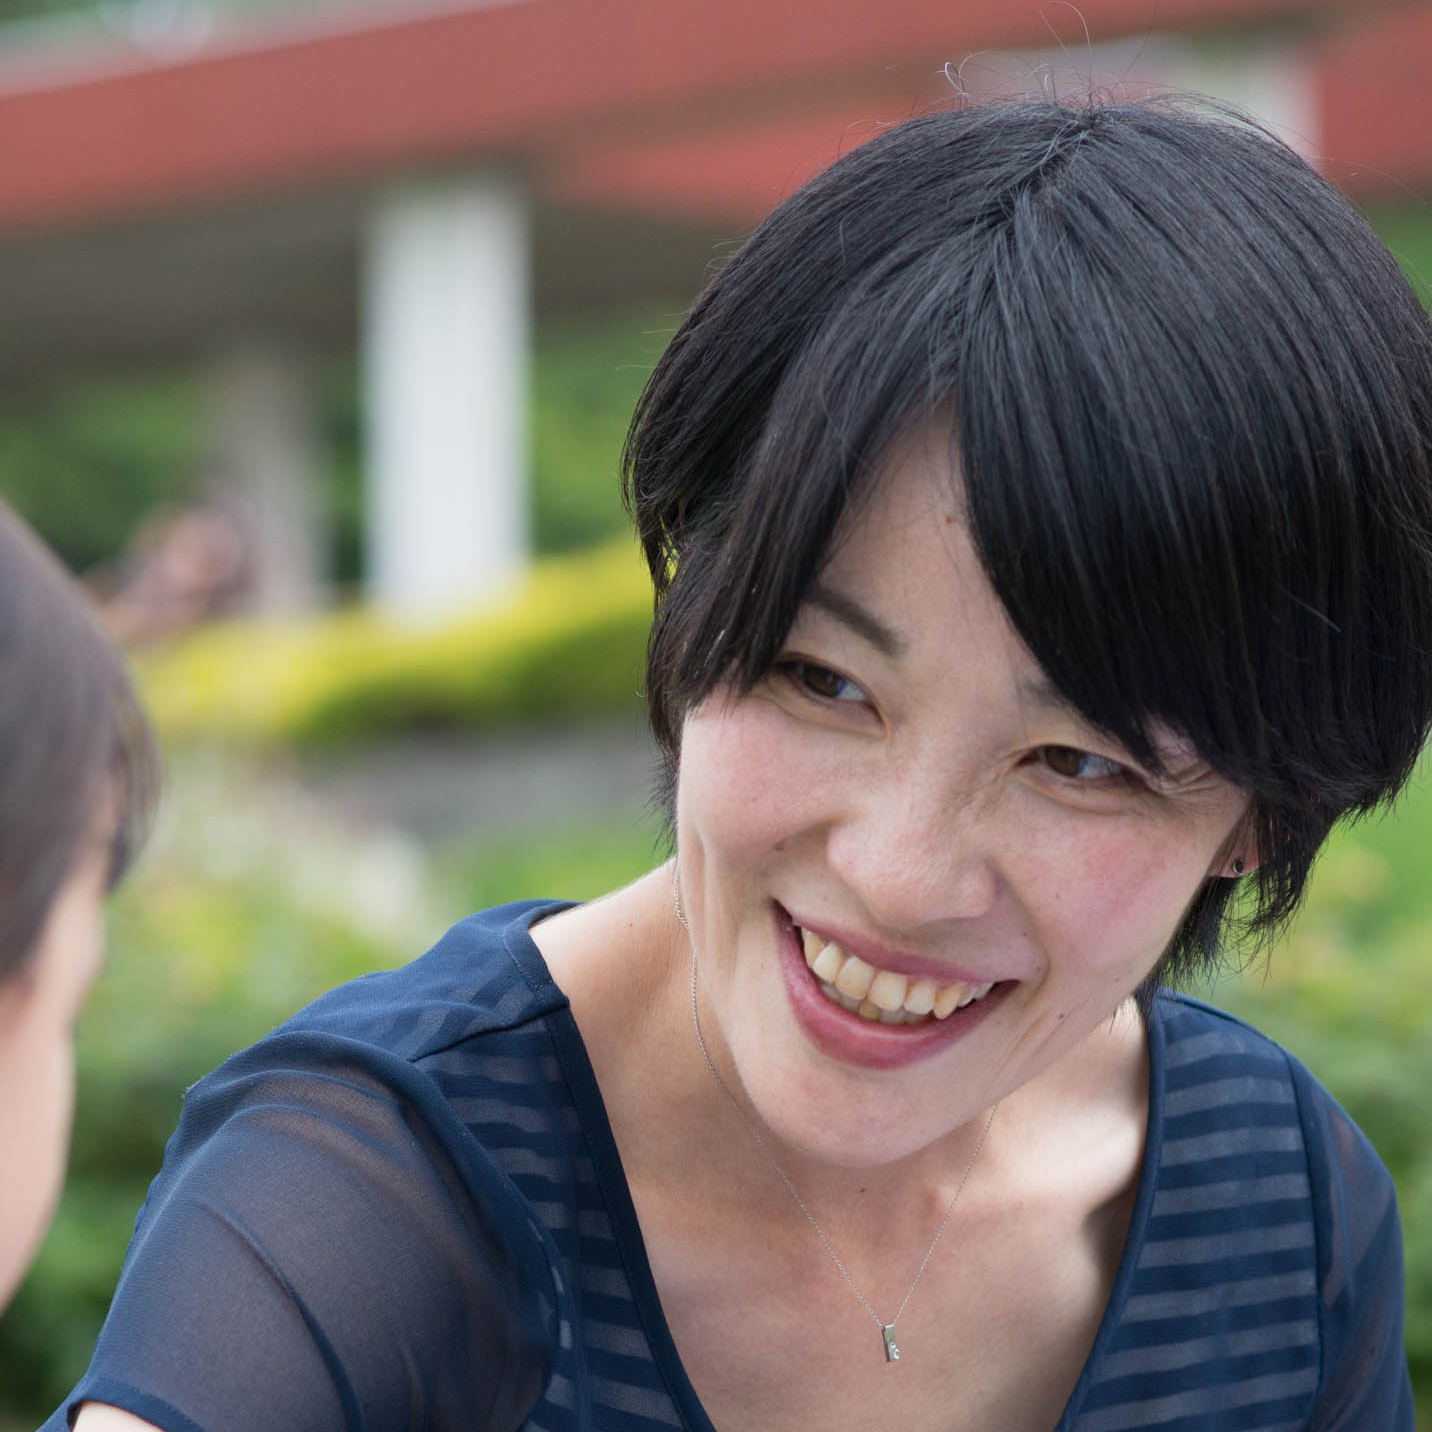 profilephoto.jpg